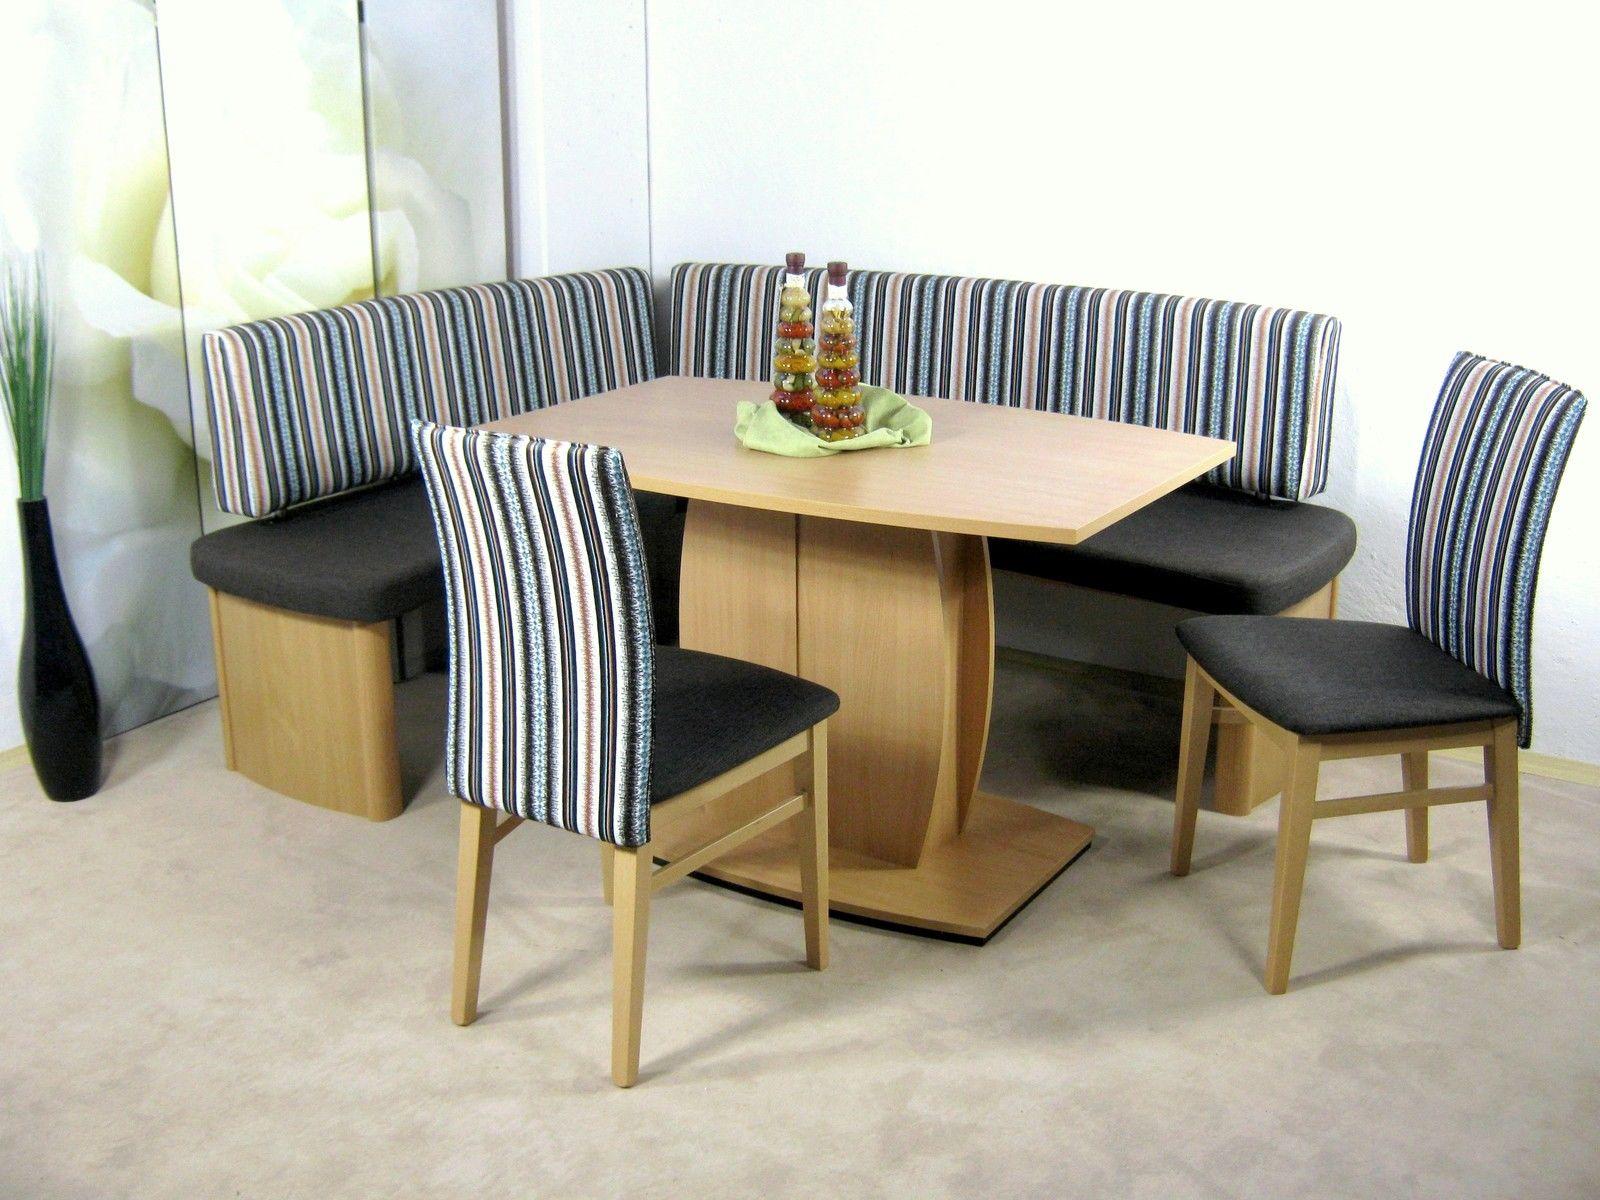 eckbankgruppe buche natur eckbank s ulentisch. Black Bedroom Furniture Sets. Home Design Ideas